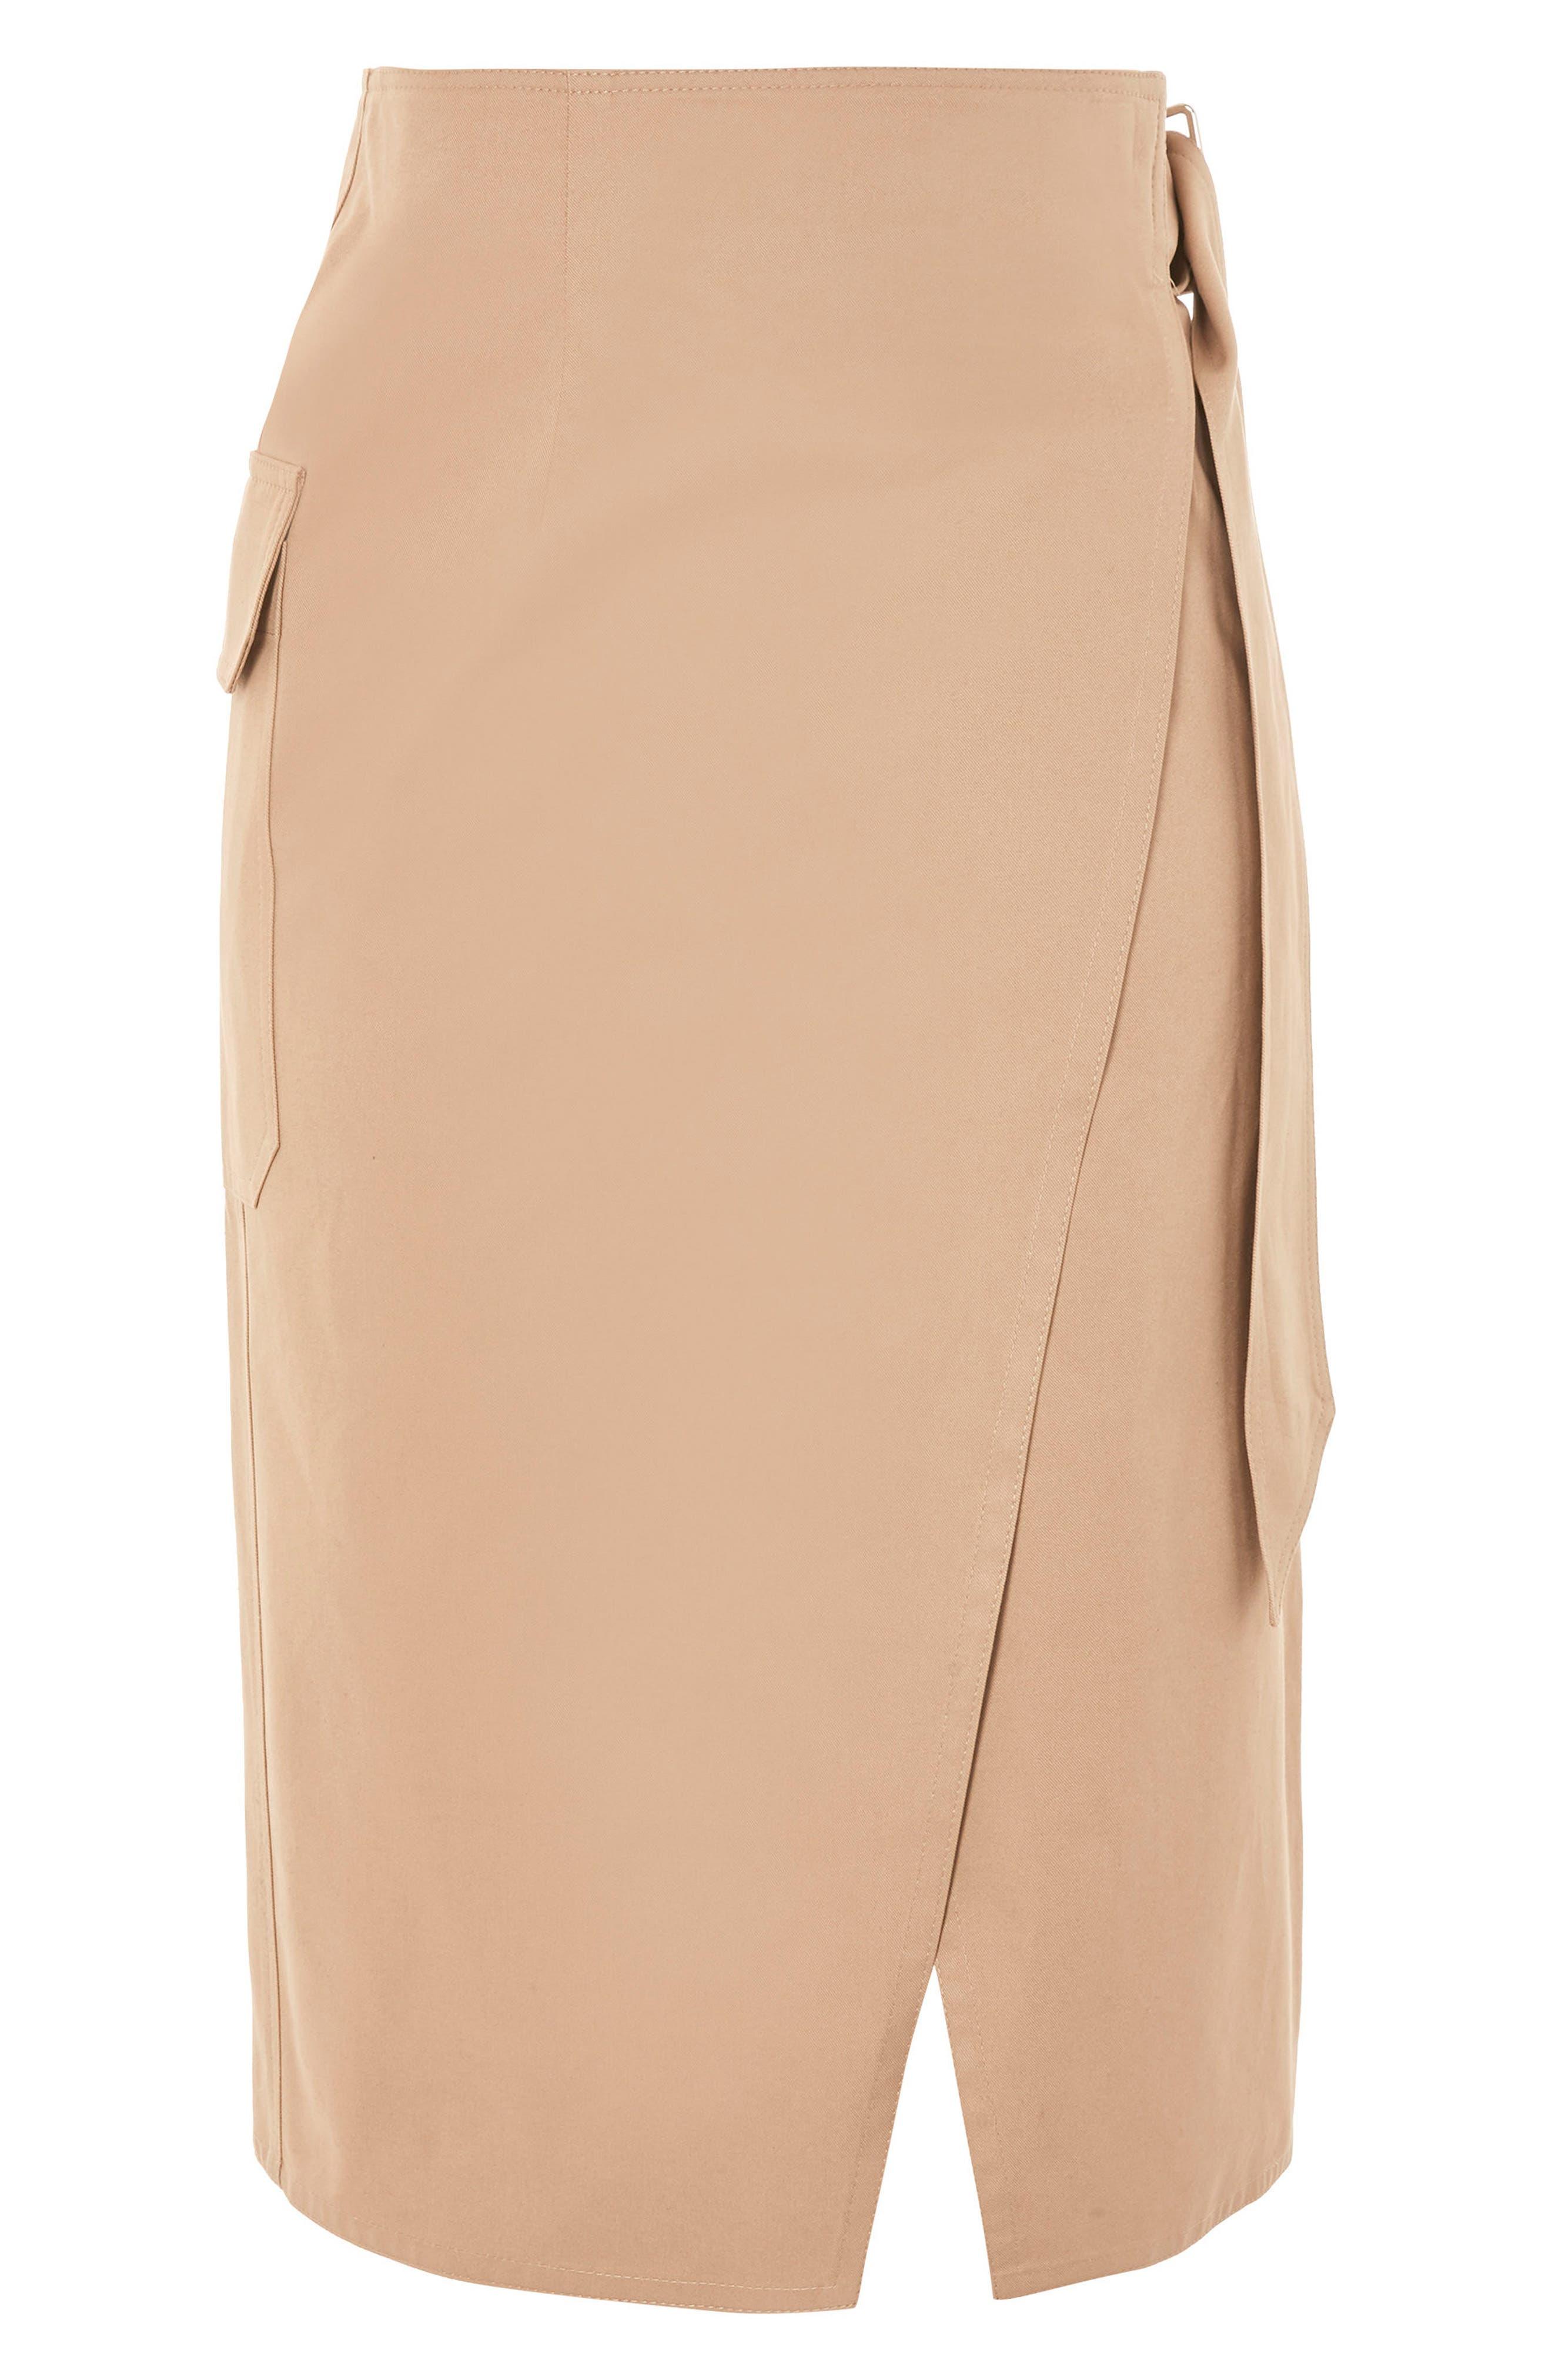 Boutique Utility Wrap Skirt,                             Main thumbnail 1, color,                             Stone